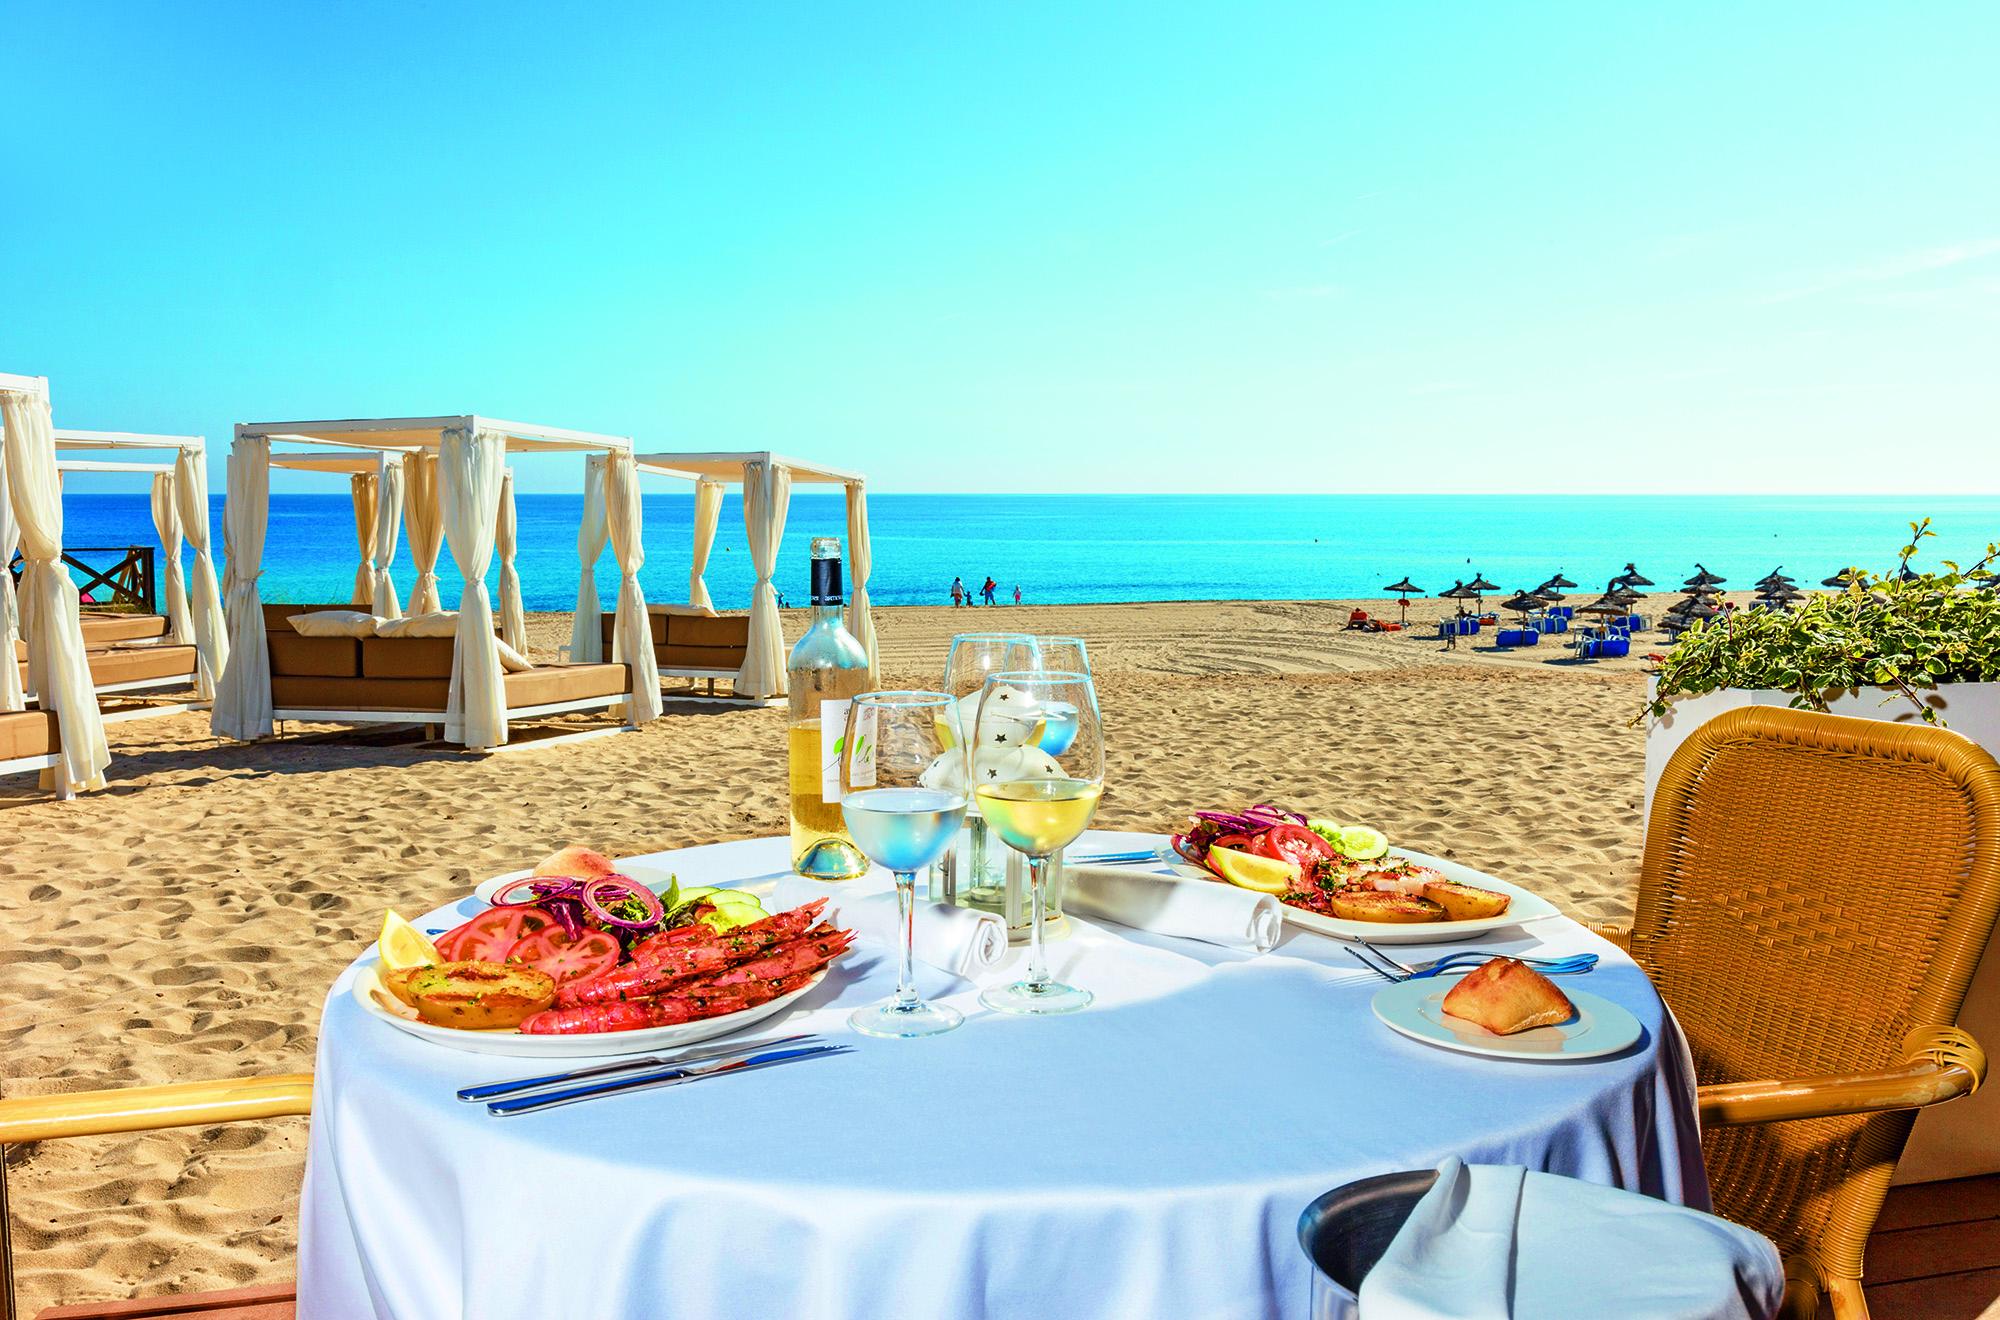 2016-06-VIVA CM RESORT Mirablau Beach Restaurant 1.jpg